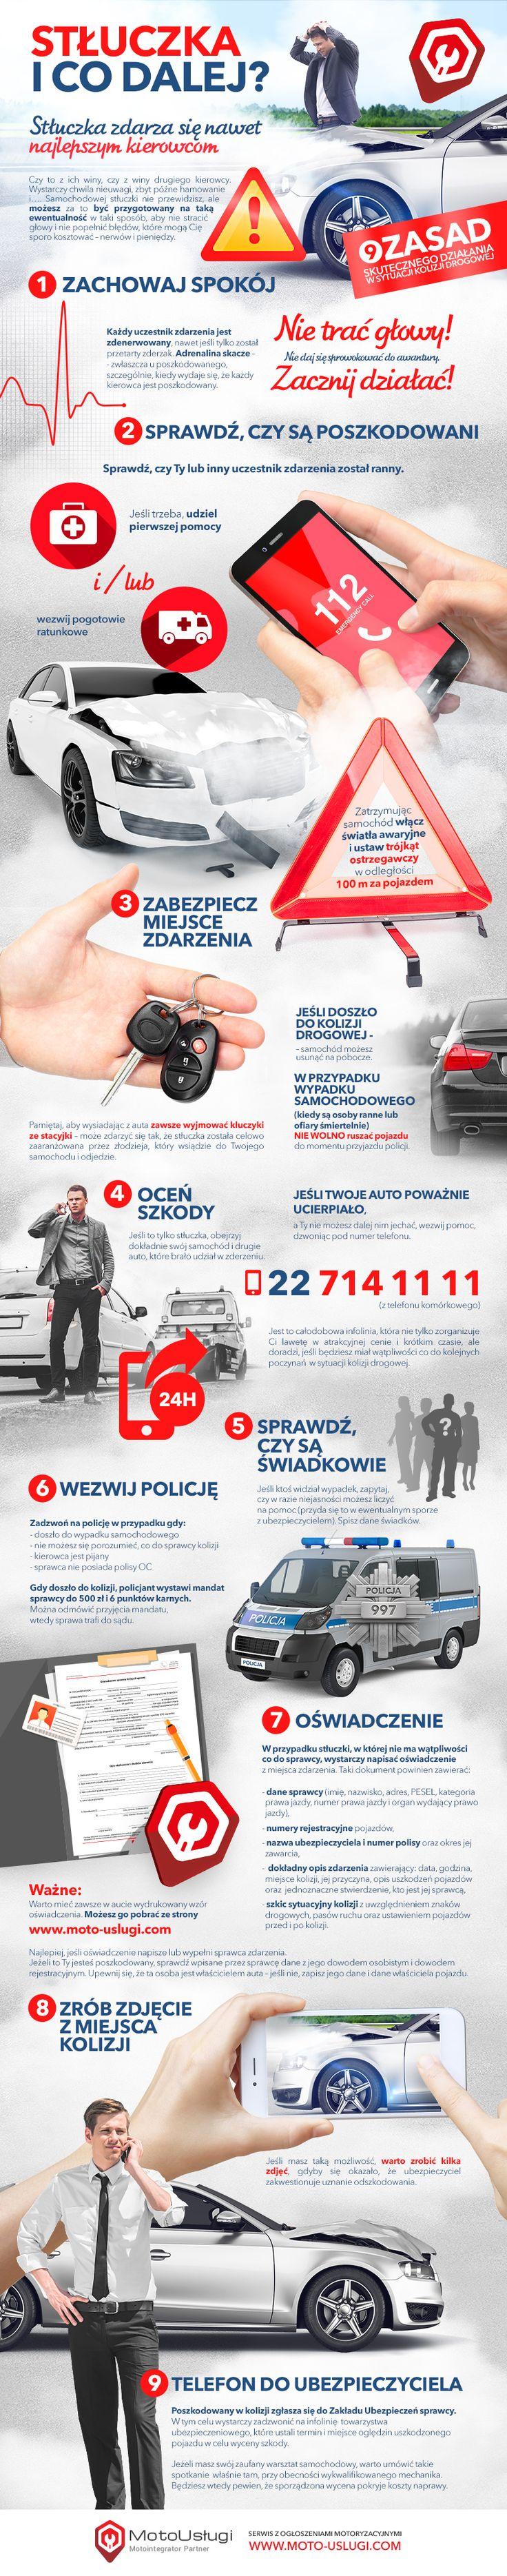 #infografika #motoryzacja #samochód #kreacja #infographic #creative